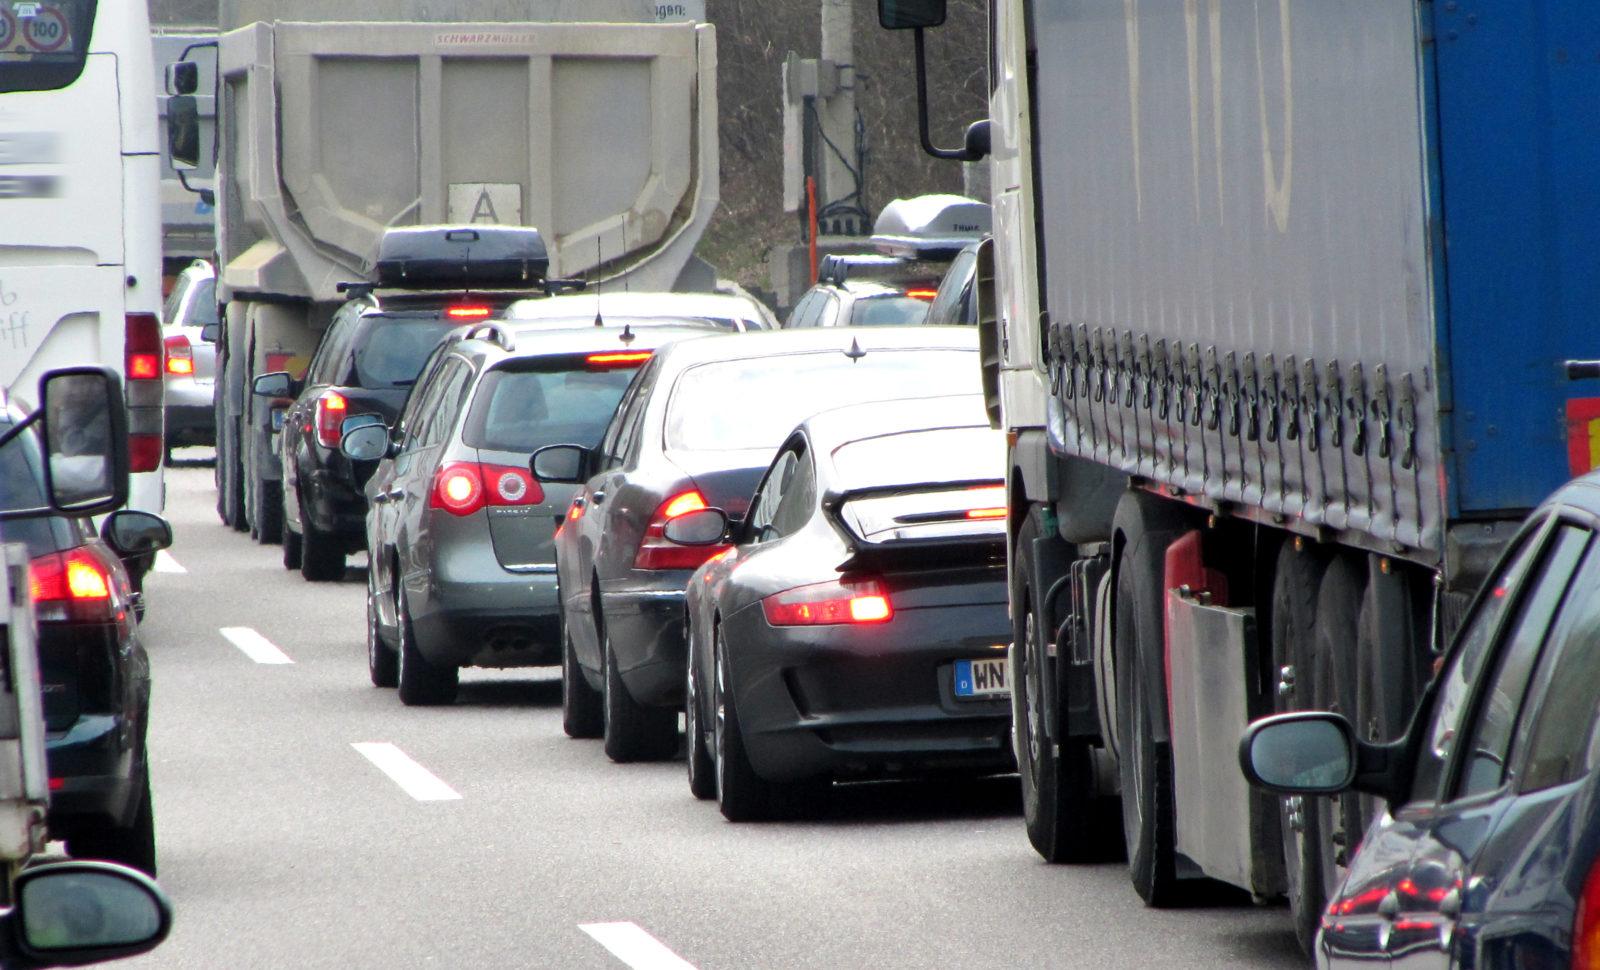 Messe transport logistic / Speditionssoftware / cargo support: LiveDispo löst Probleme im Voraus